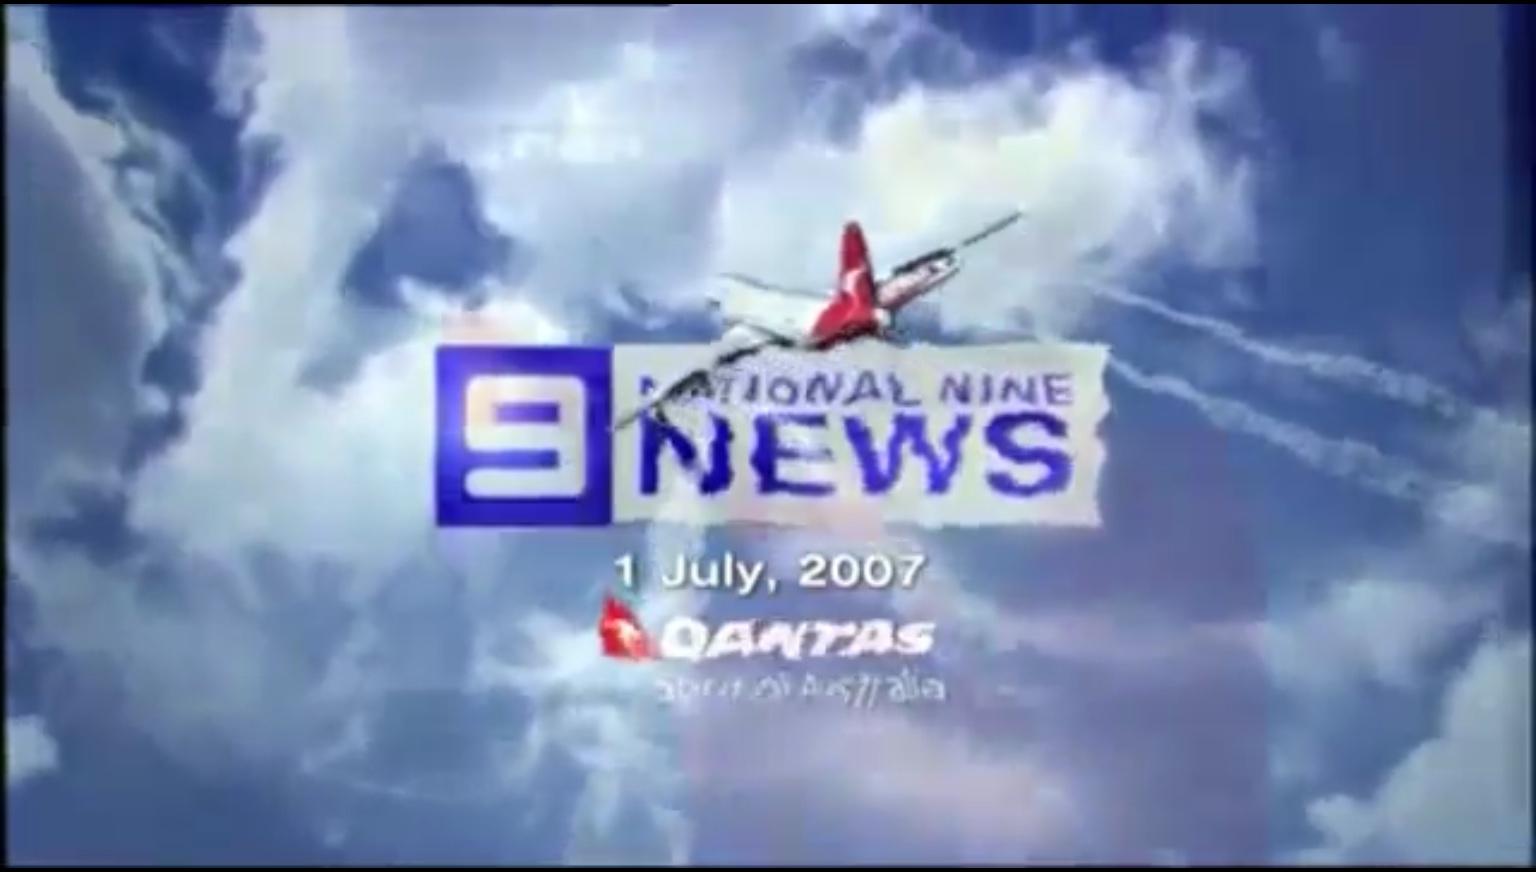 Nine News/National bulletins